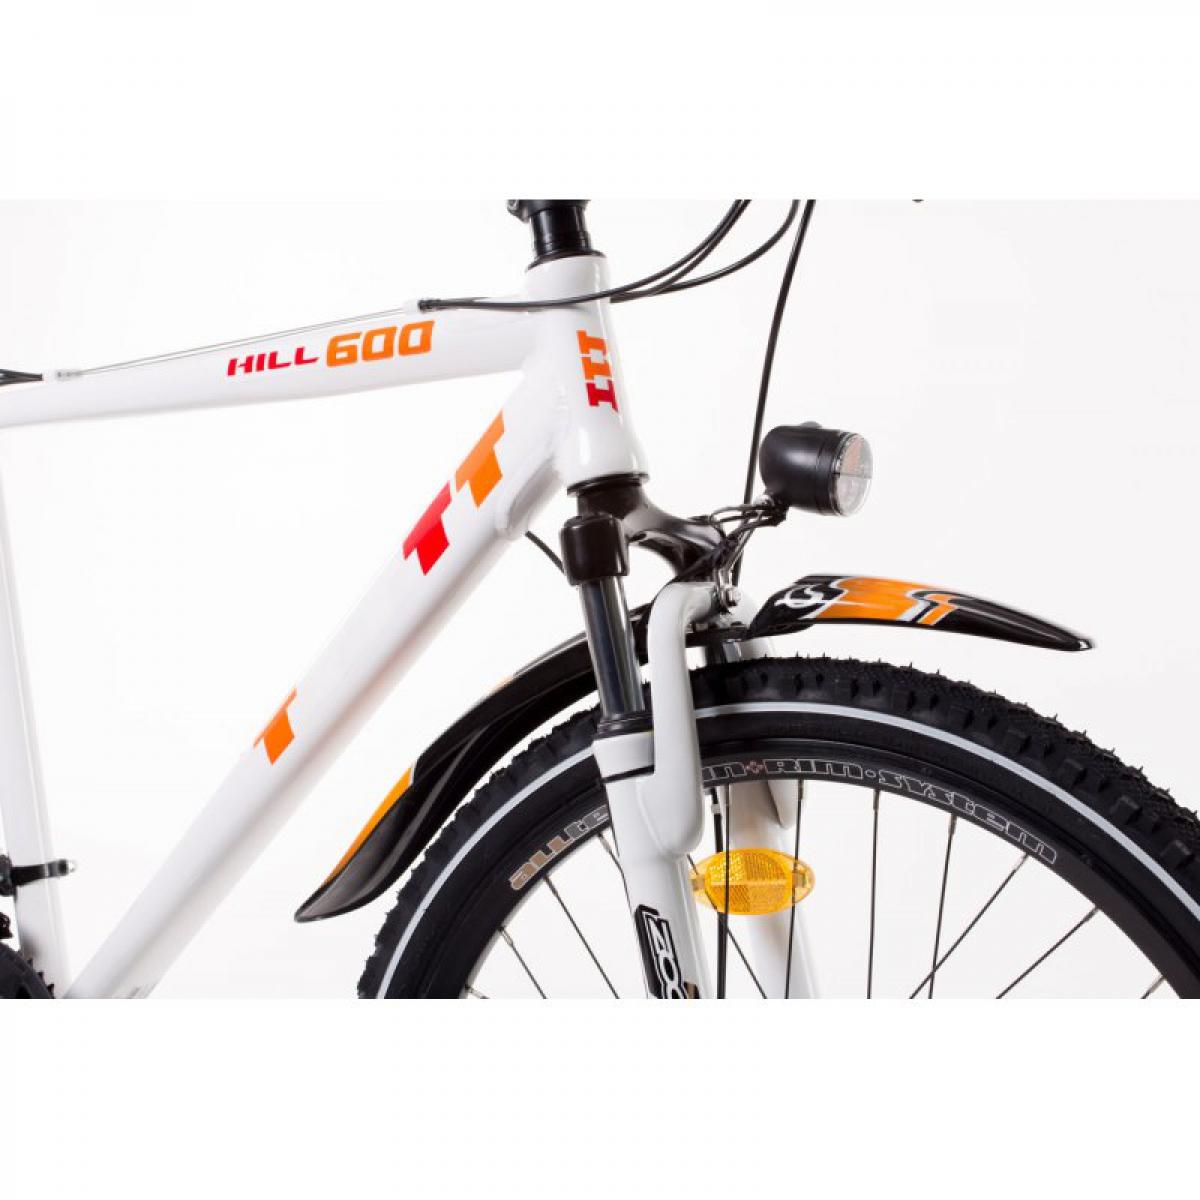 26 zoll mtb cross mifa fahrrad bike shimano 21 gang stvzo disc scheibenbremsen ihr fahrrad. Black Bedroom Furniture Sets. Home Design Ideas